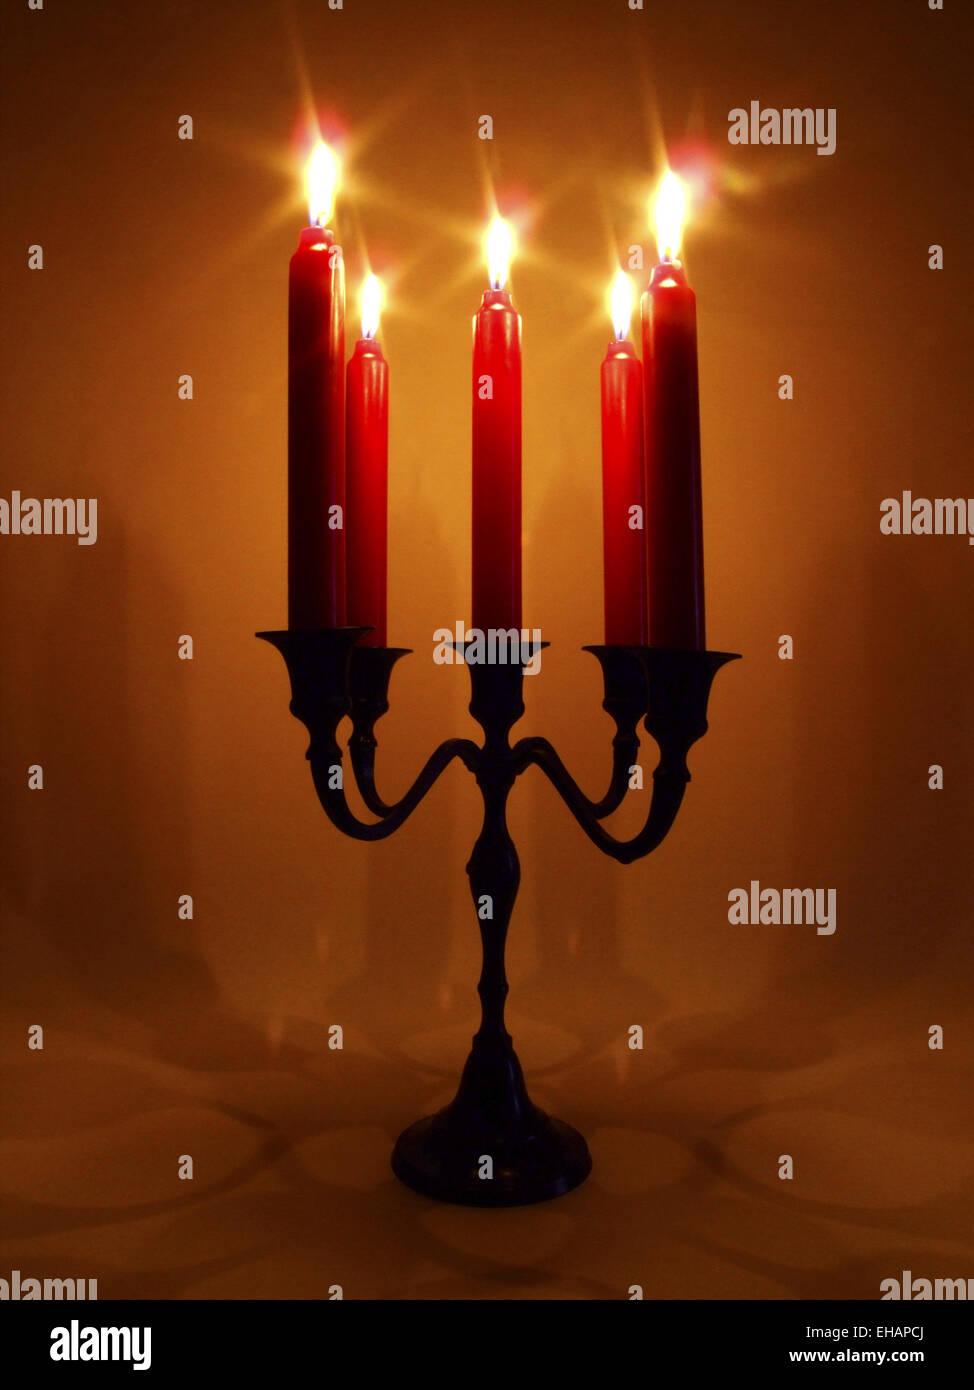 brennende Kerzen / candles - Stock Image